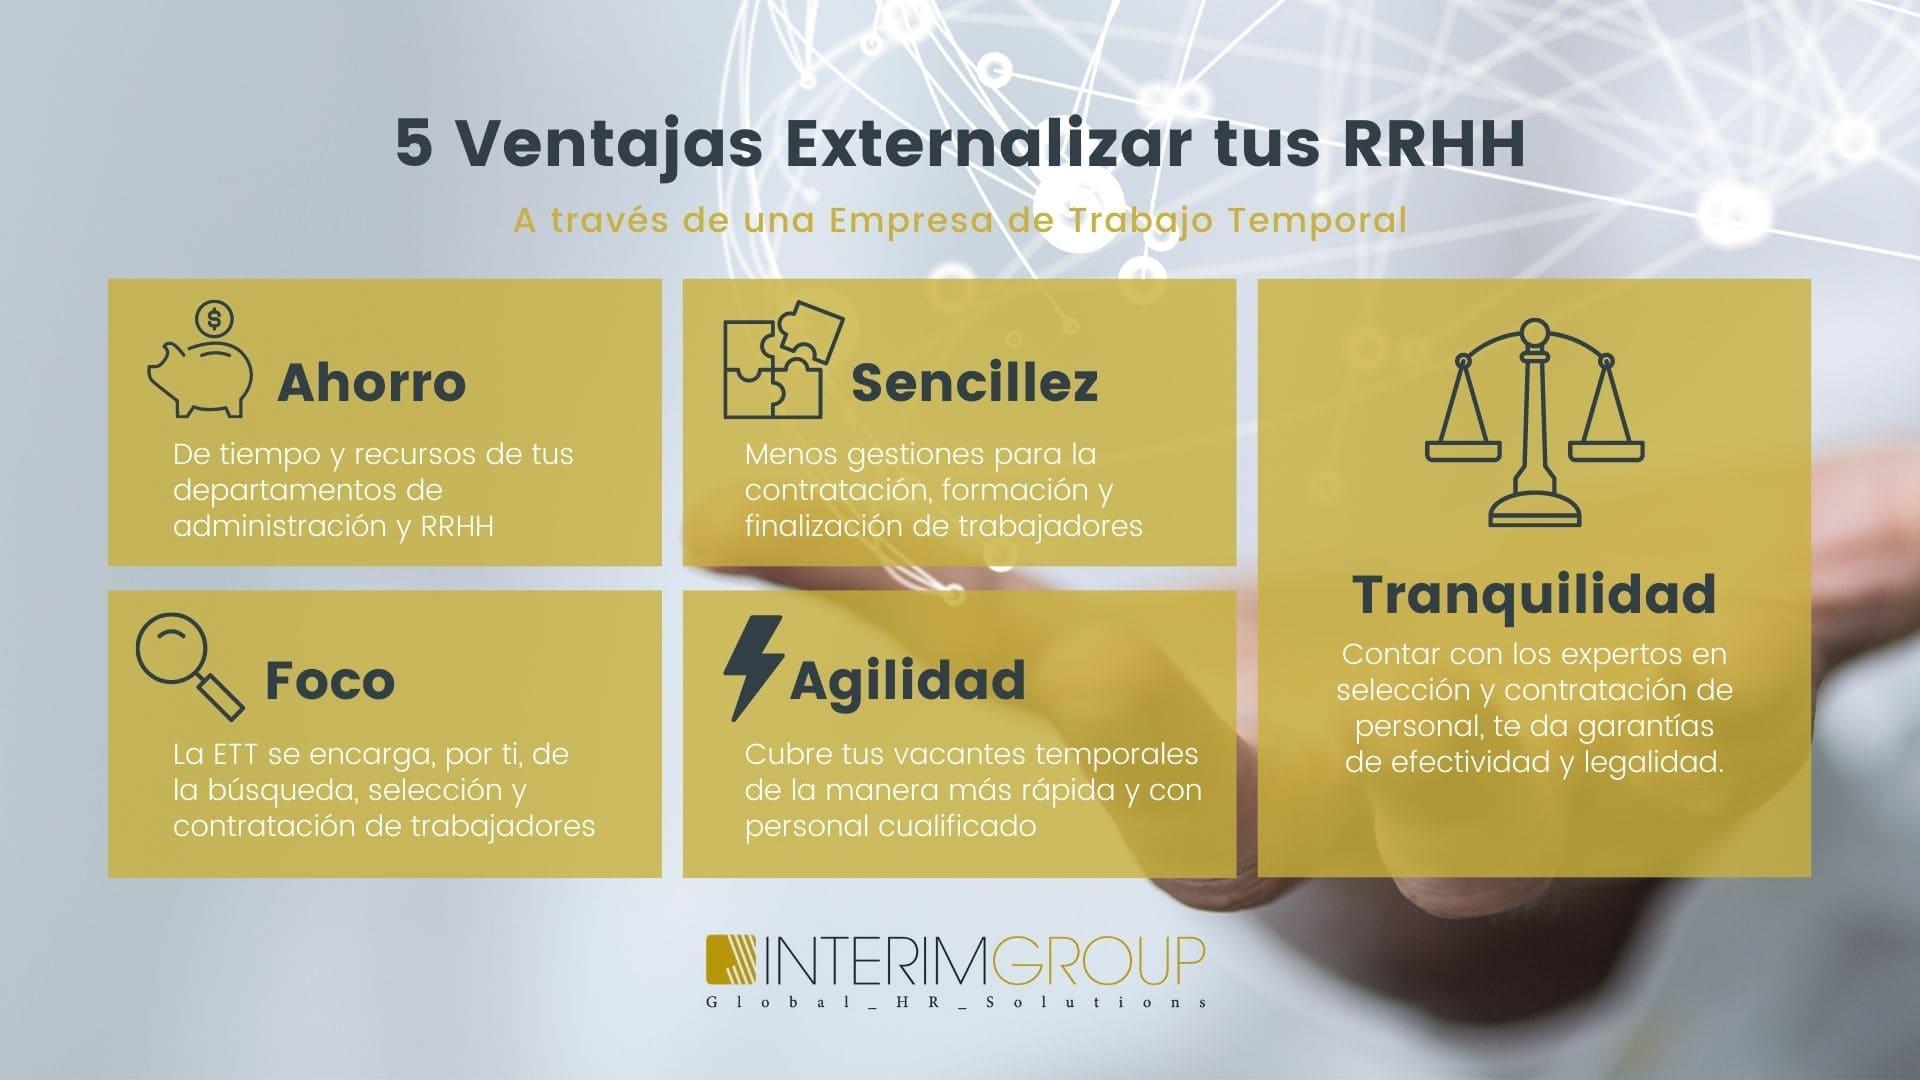 Ventajas de externalizar tus RRHH_INTERIM-GROUP